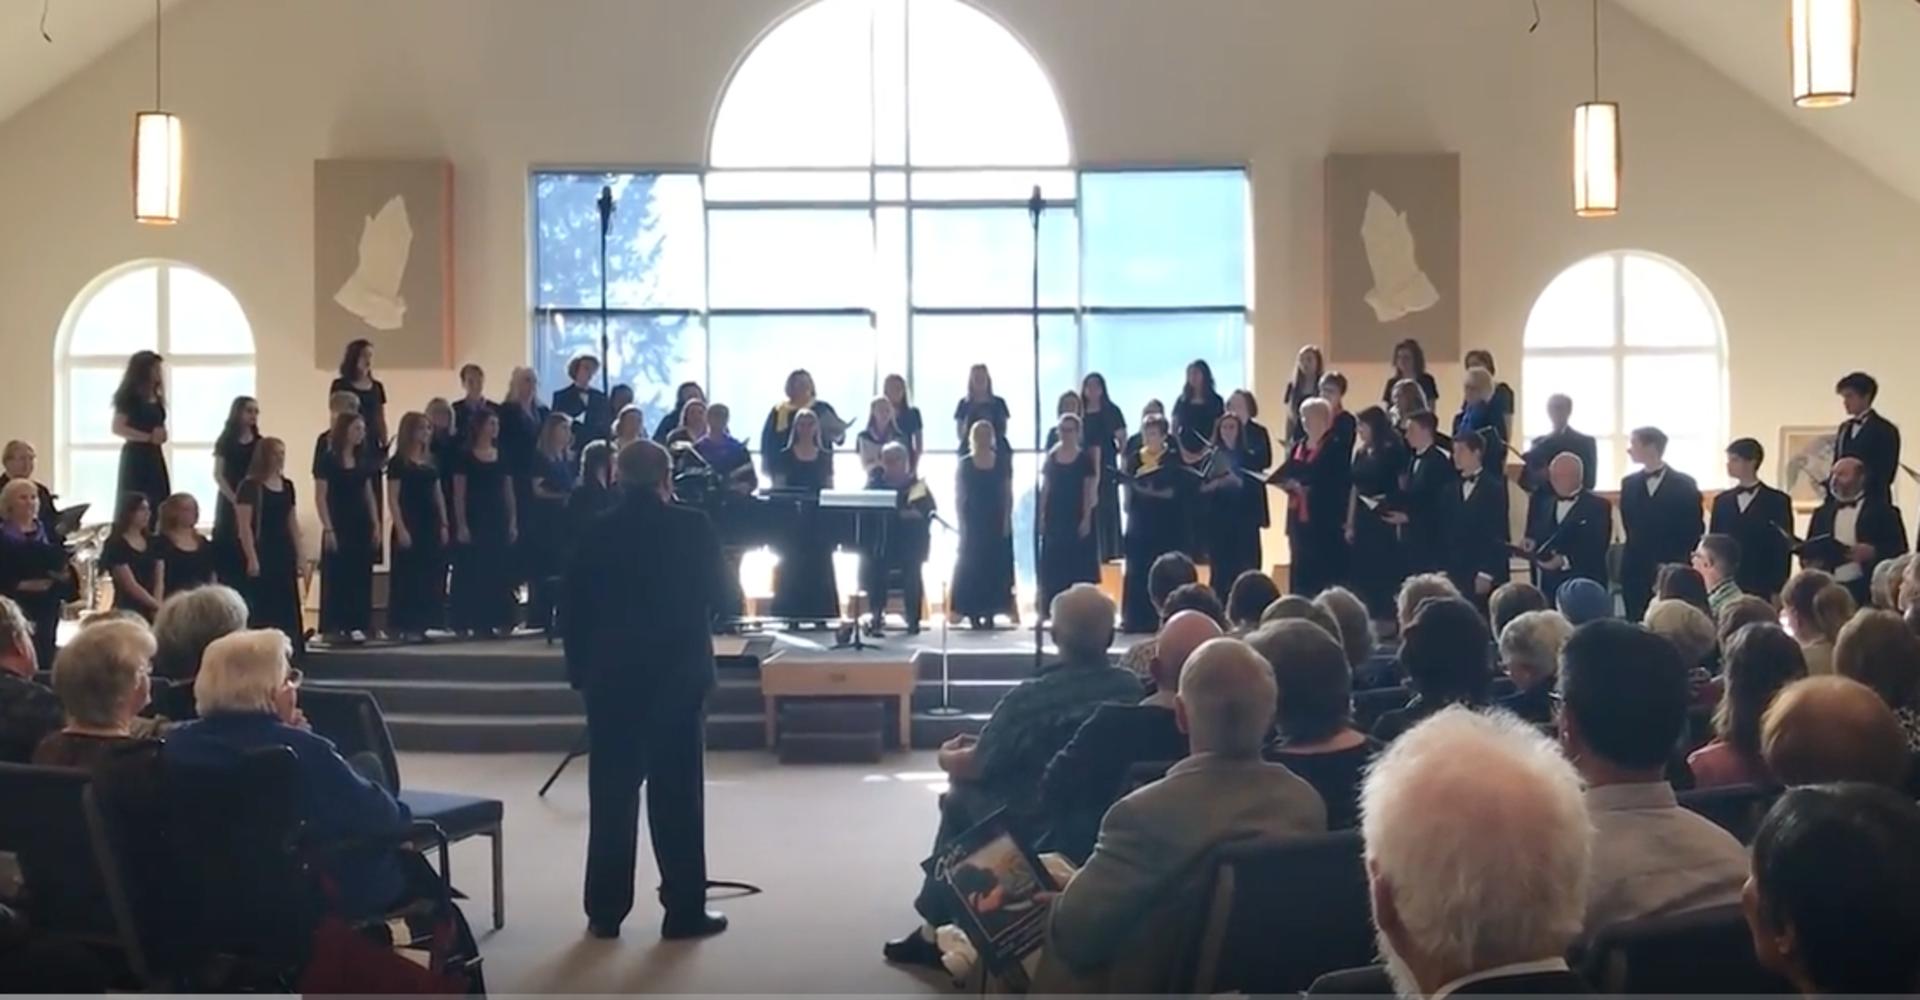 Cora Voce Annual Spring Concert on Fox Island